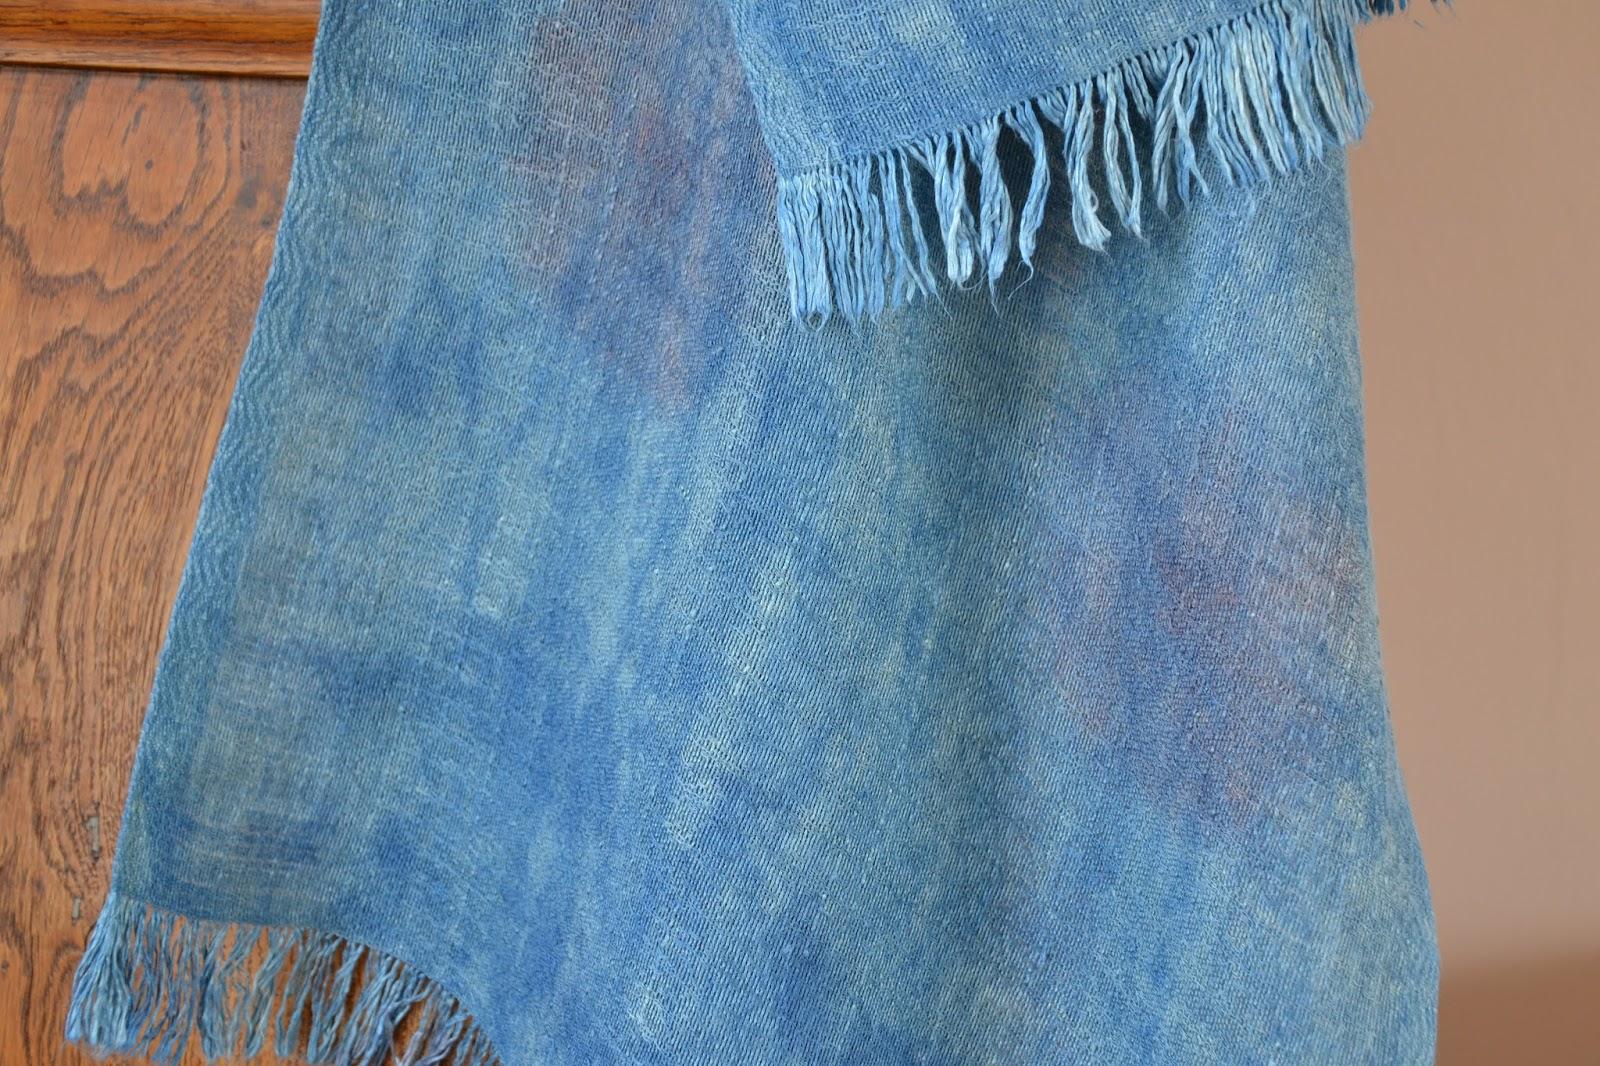 fbg cr ations cr ations textiles artistiques tissage fait main. Black Bedroom Furniture Sets. Home Design Ideas